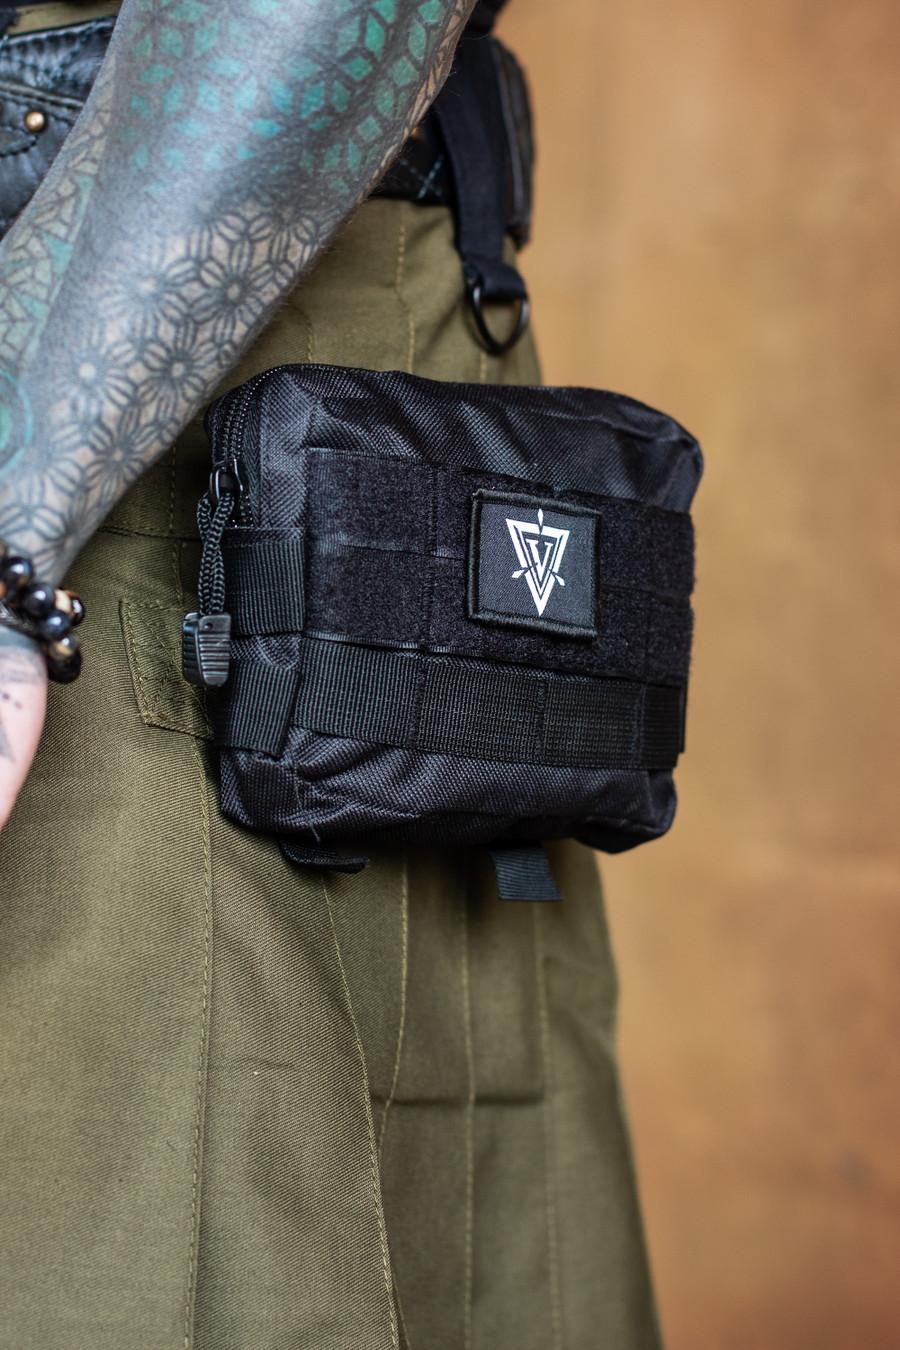 Vanguard X3 Kilt Pouch